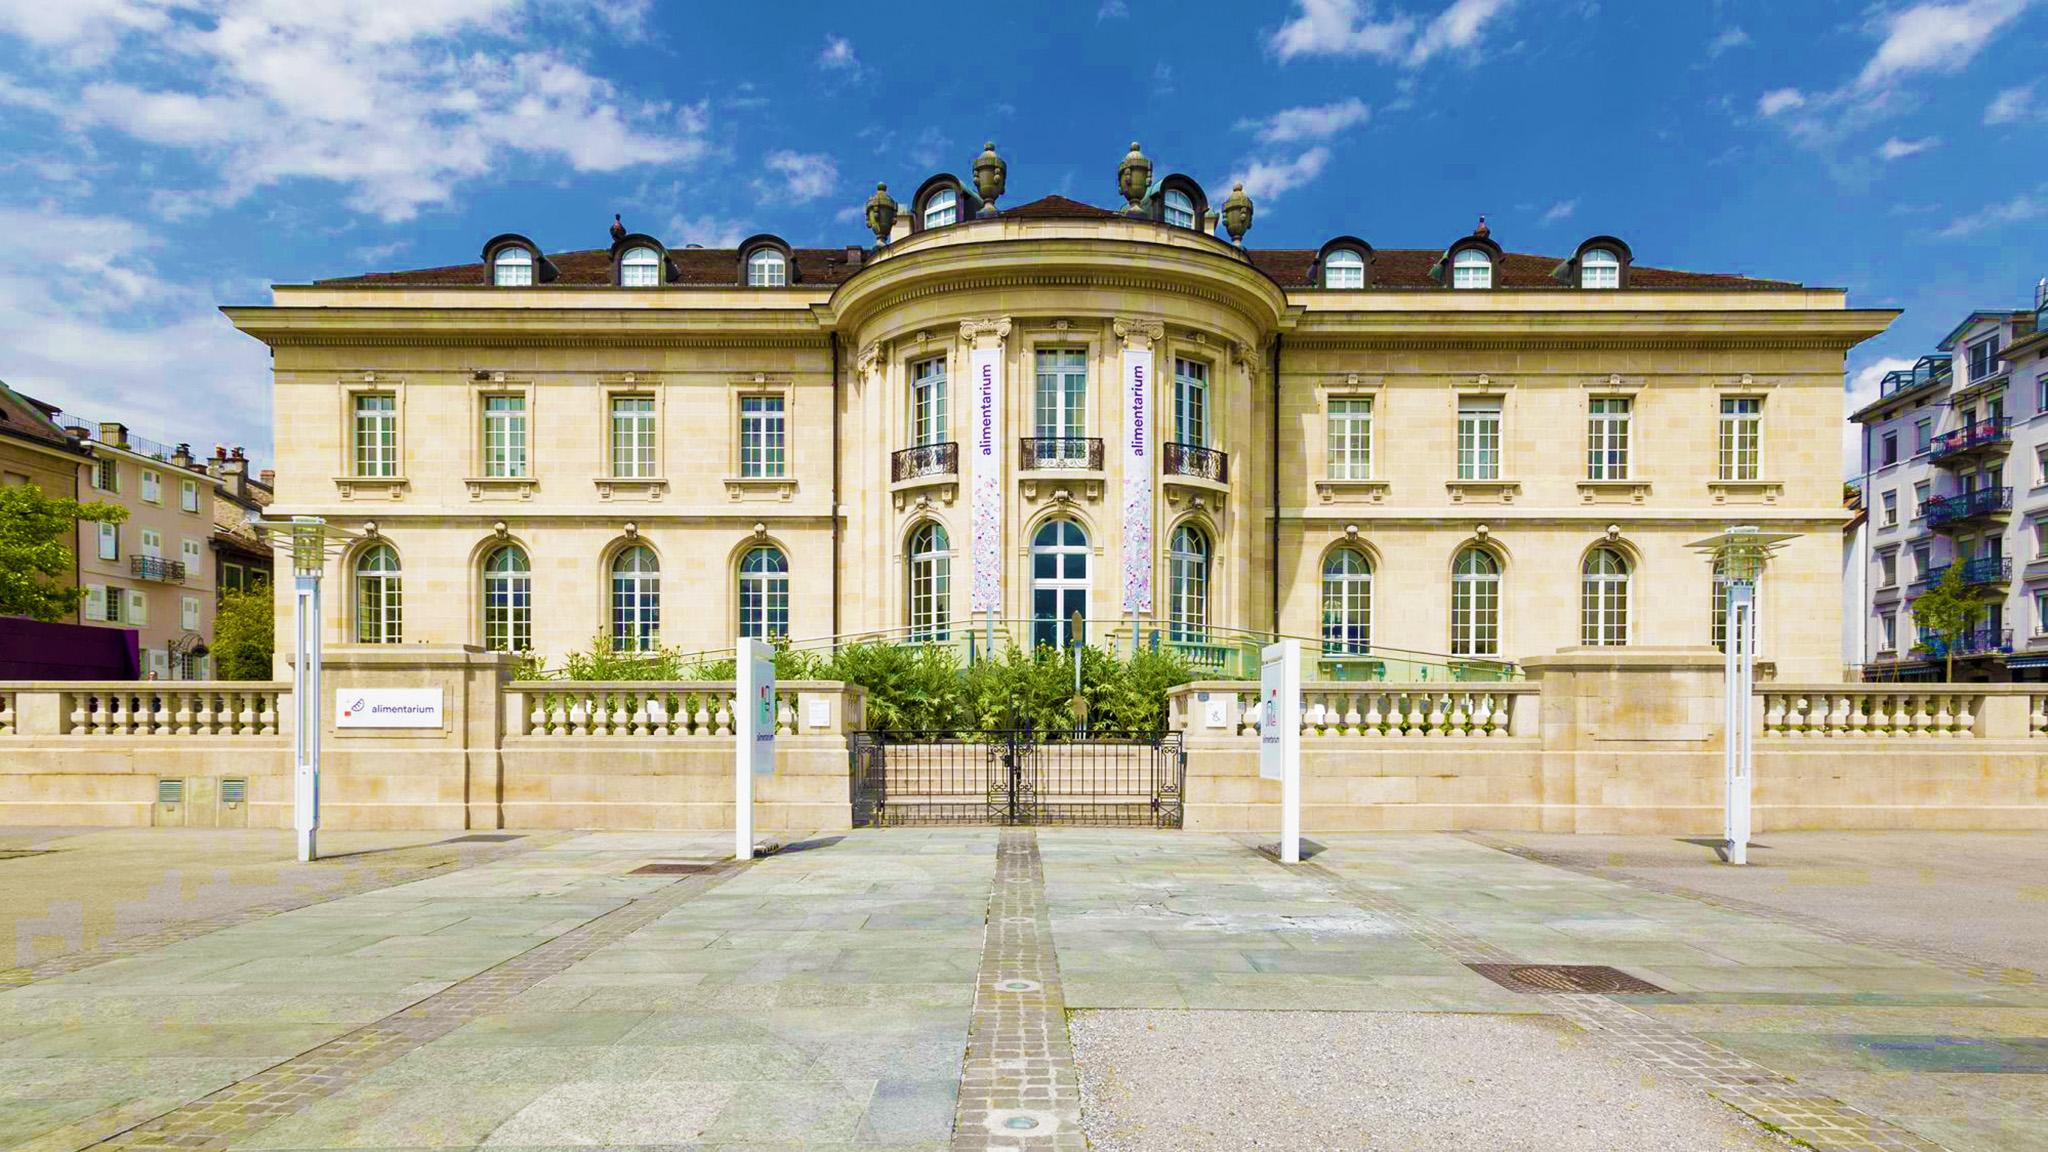 kt_2020_300_Keytours_excursions_Swisstours_vevey_alimentarium3_2048_10